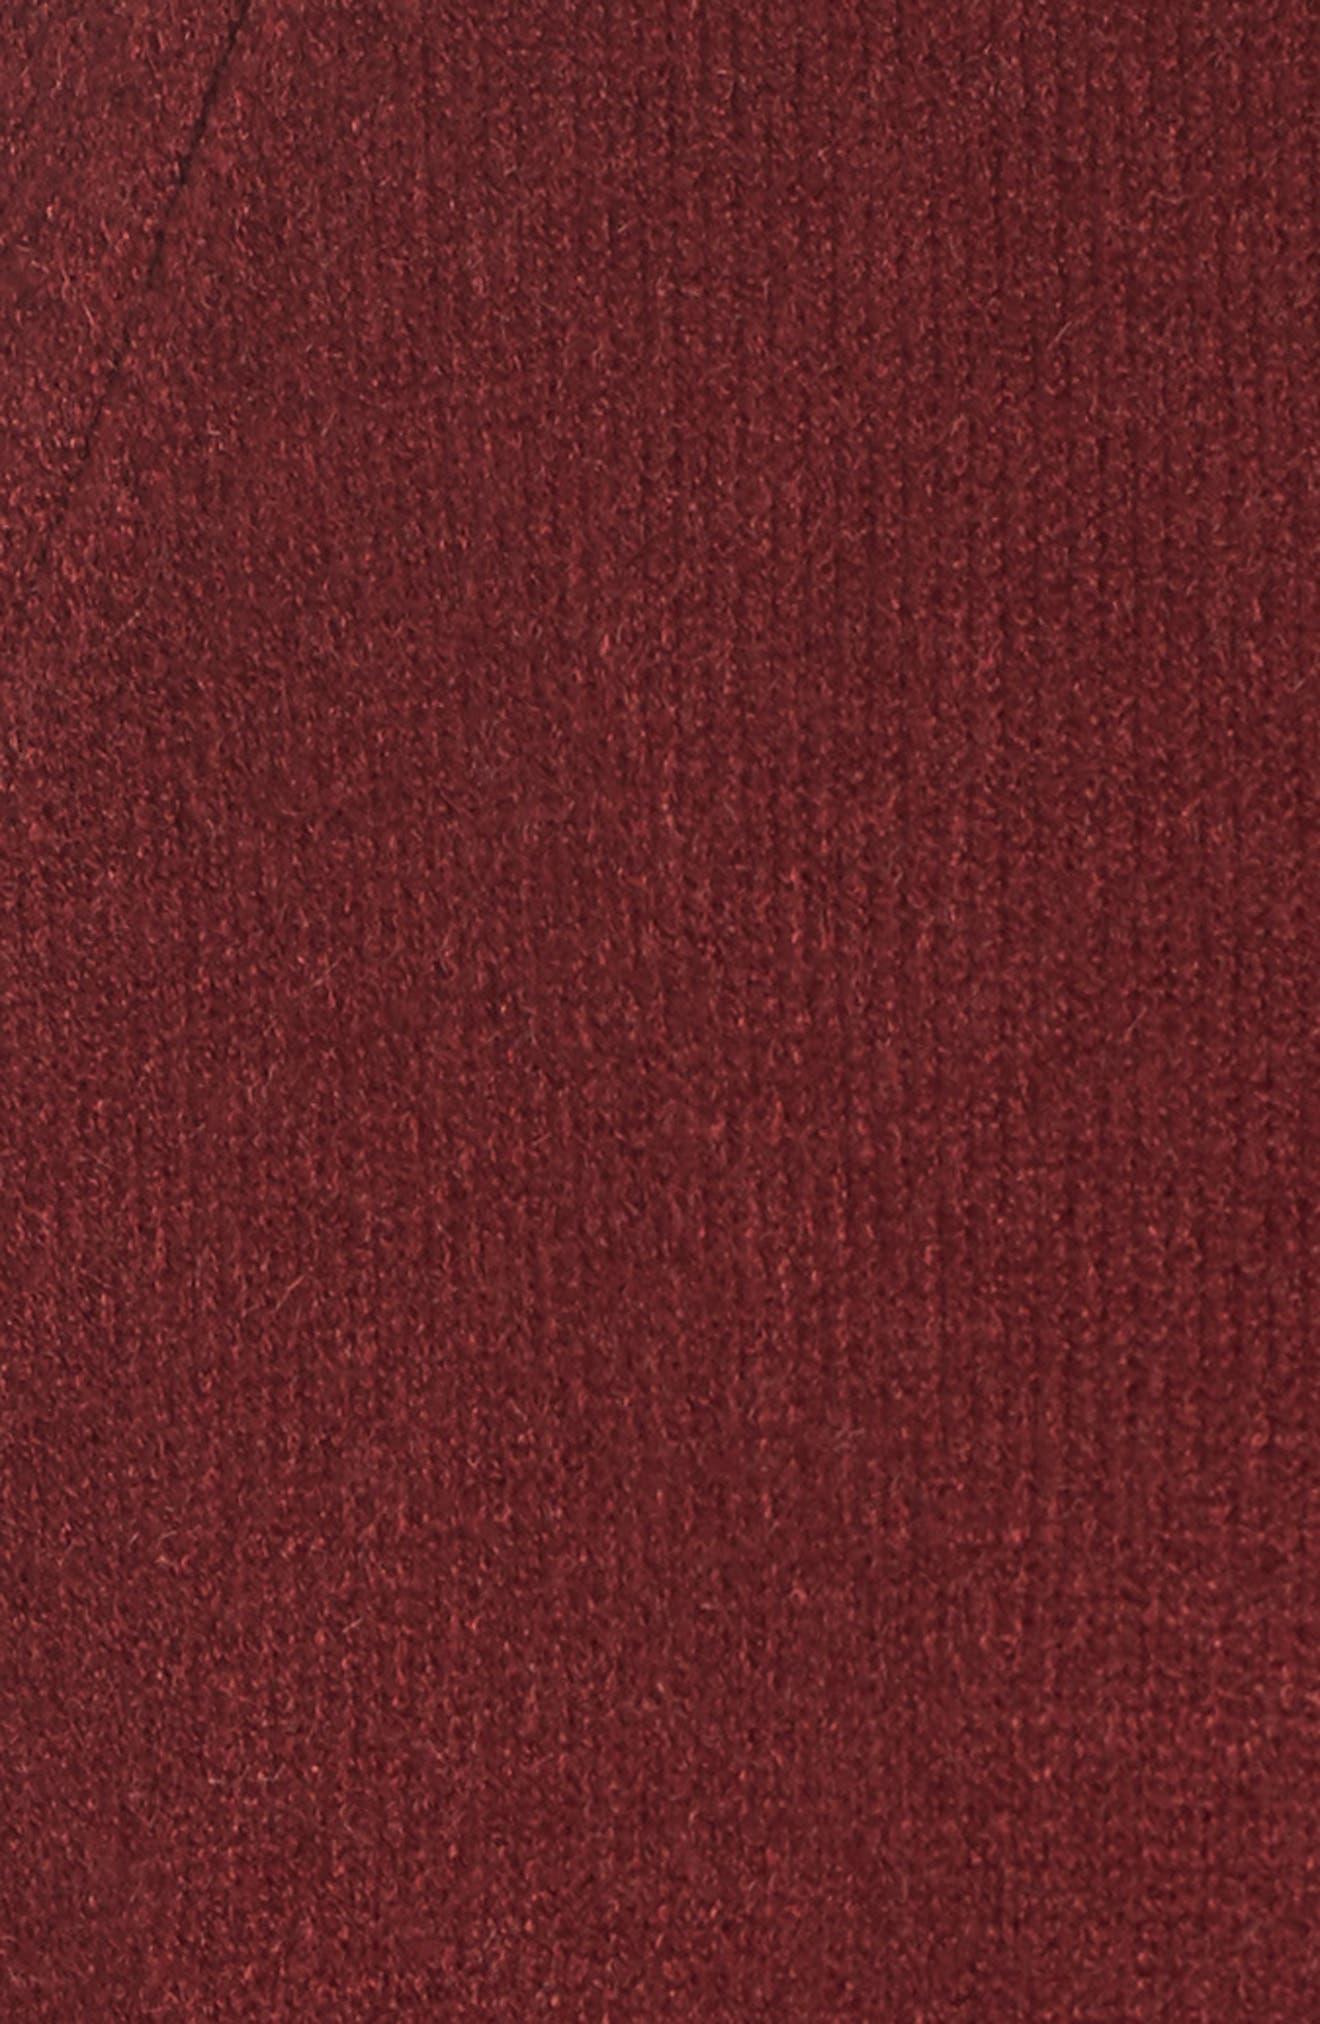 Cozy Open Cardigan,                             Alternate thumbnail 5, color,                             Burgundy